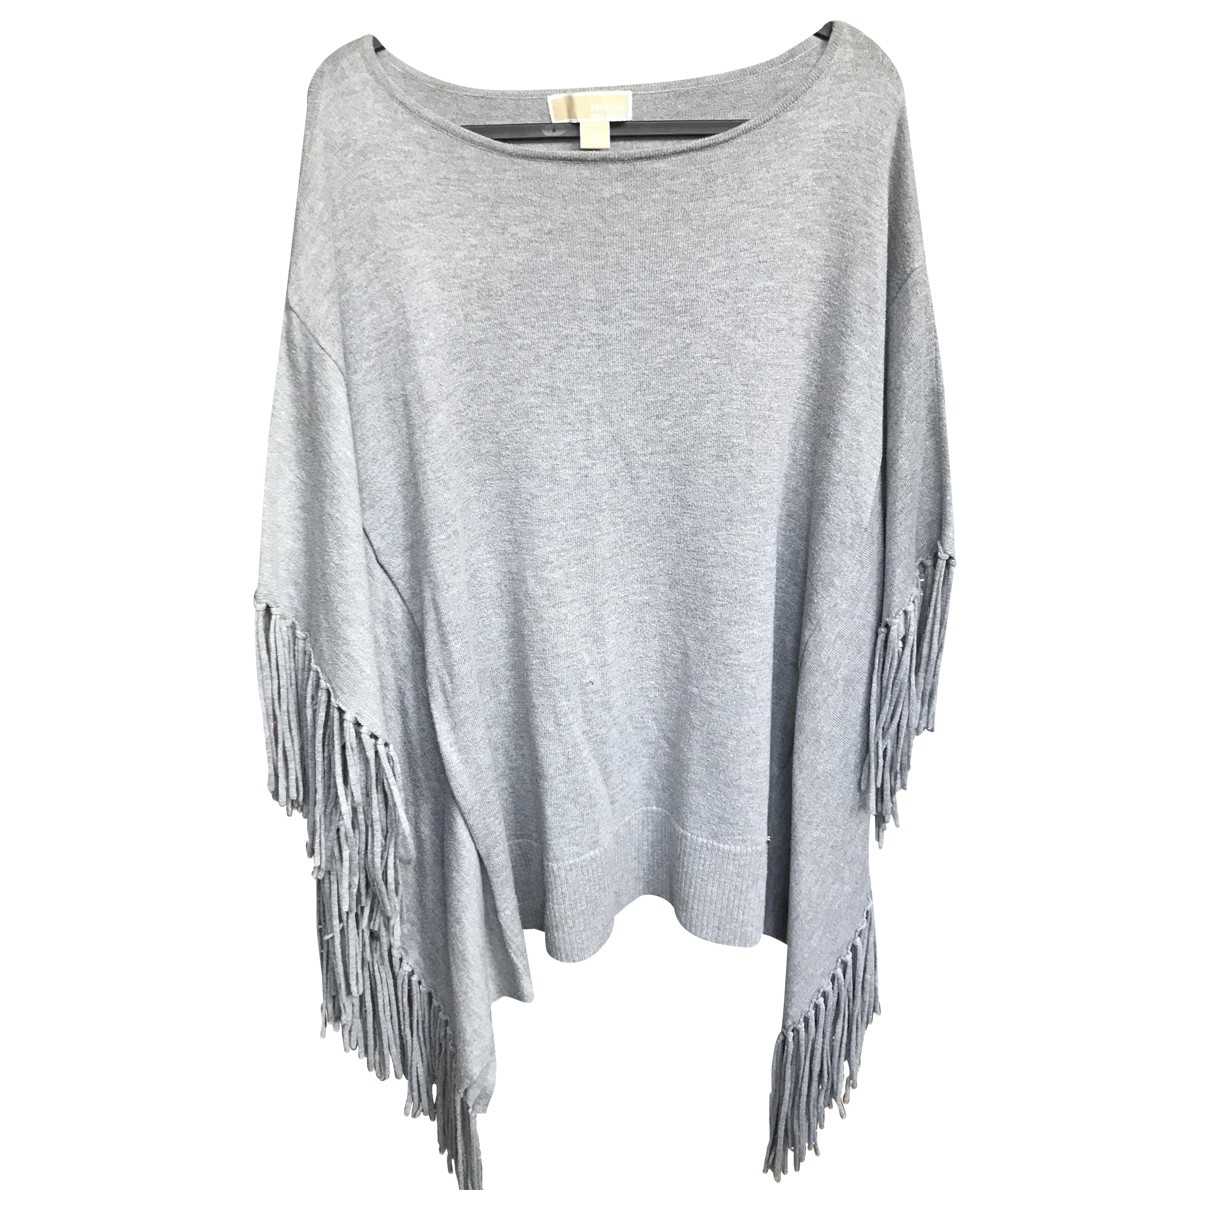 Michael Kors \N Grey Cotton Knitwear for Women 36 FR